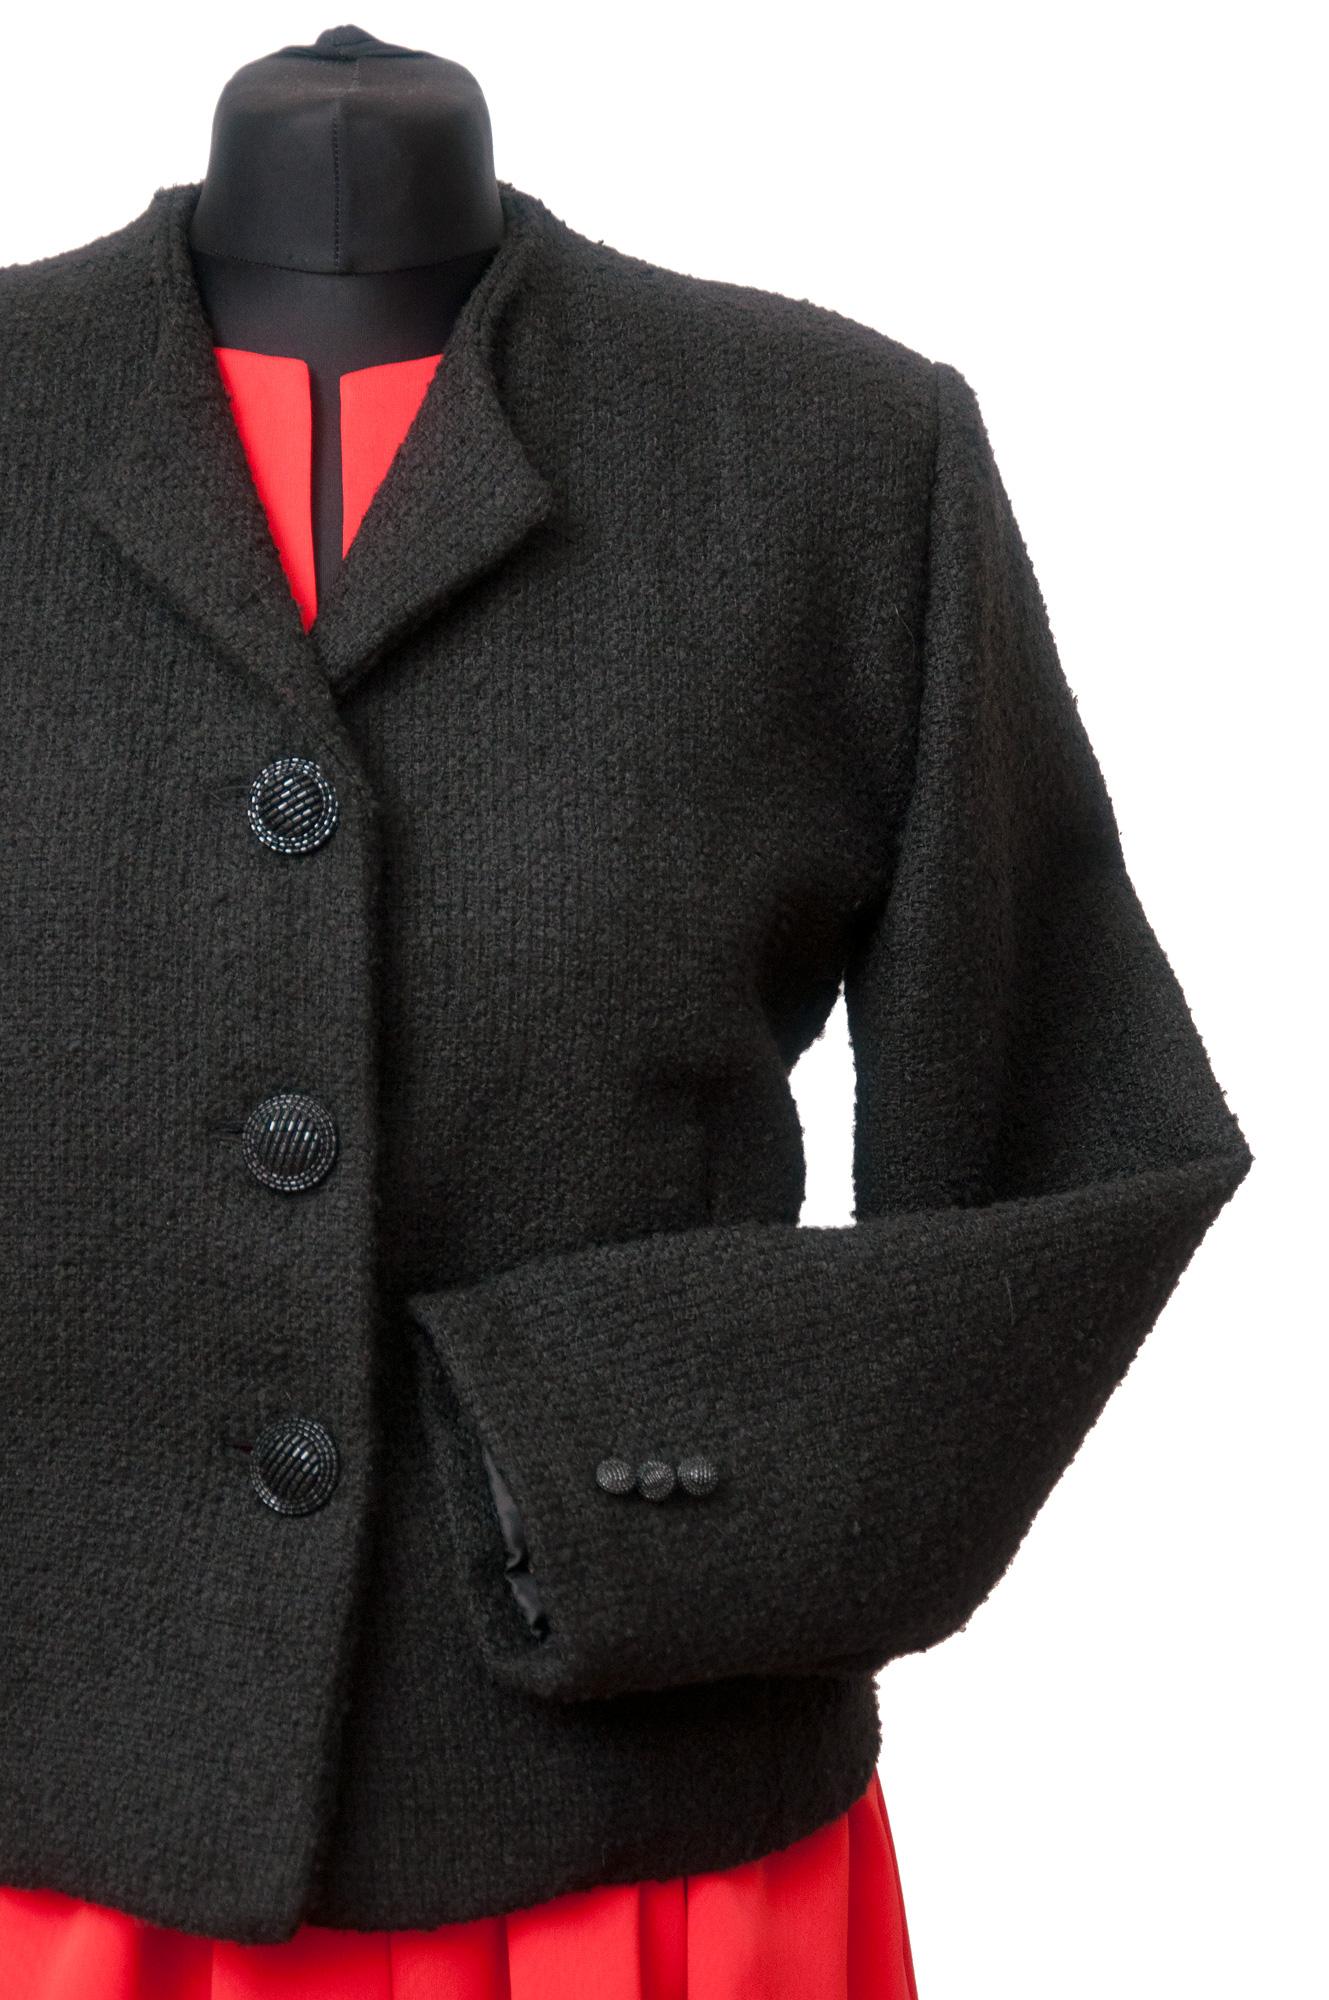 Y Dresses2kill Para Chaqueta Vestido Bautizo n6TWzBWq a8ede335c732f